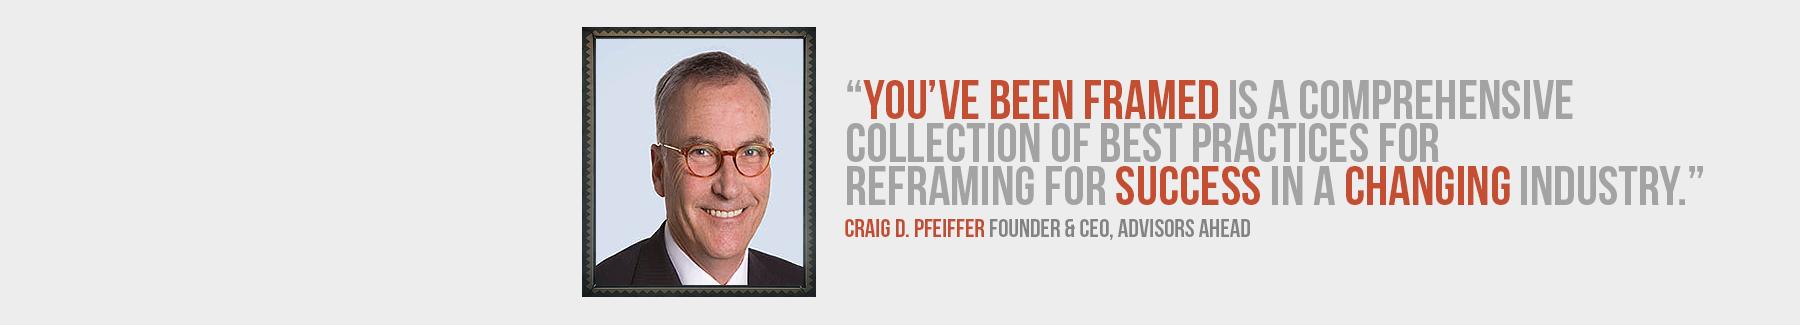 Craig Pfeiffer